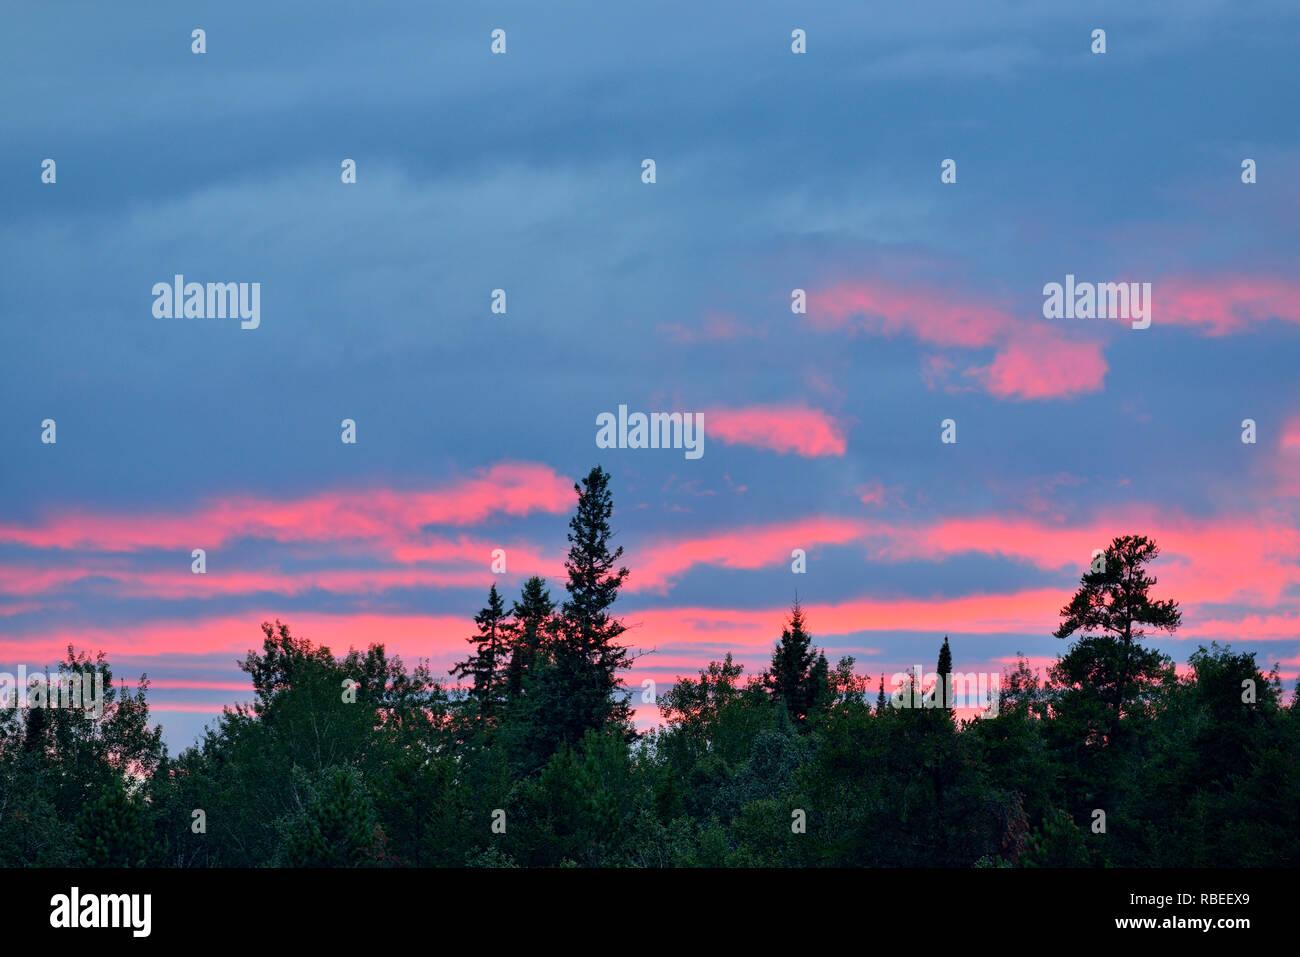 Evening sky over conifers near Halfway Lake, Halfway Lake Provincial Park, Ontario, Canada - Stock Image